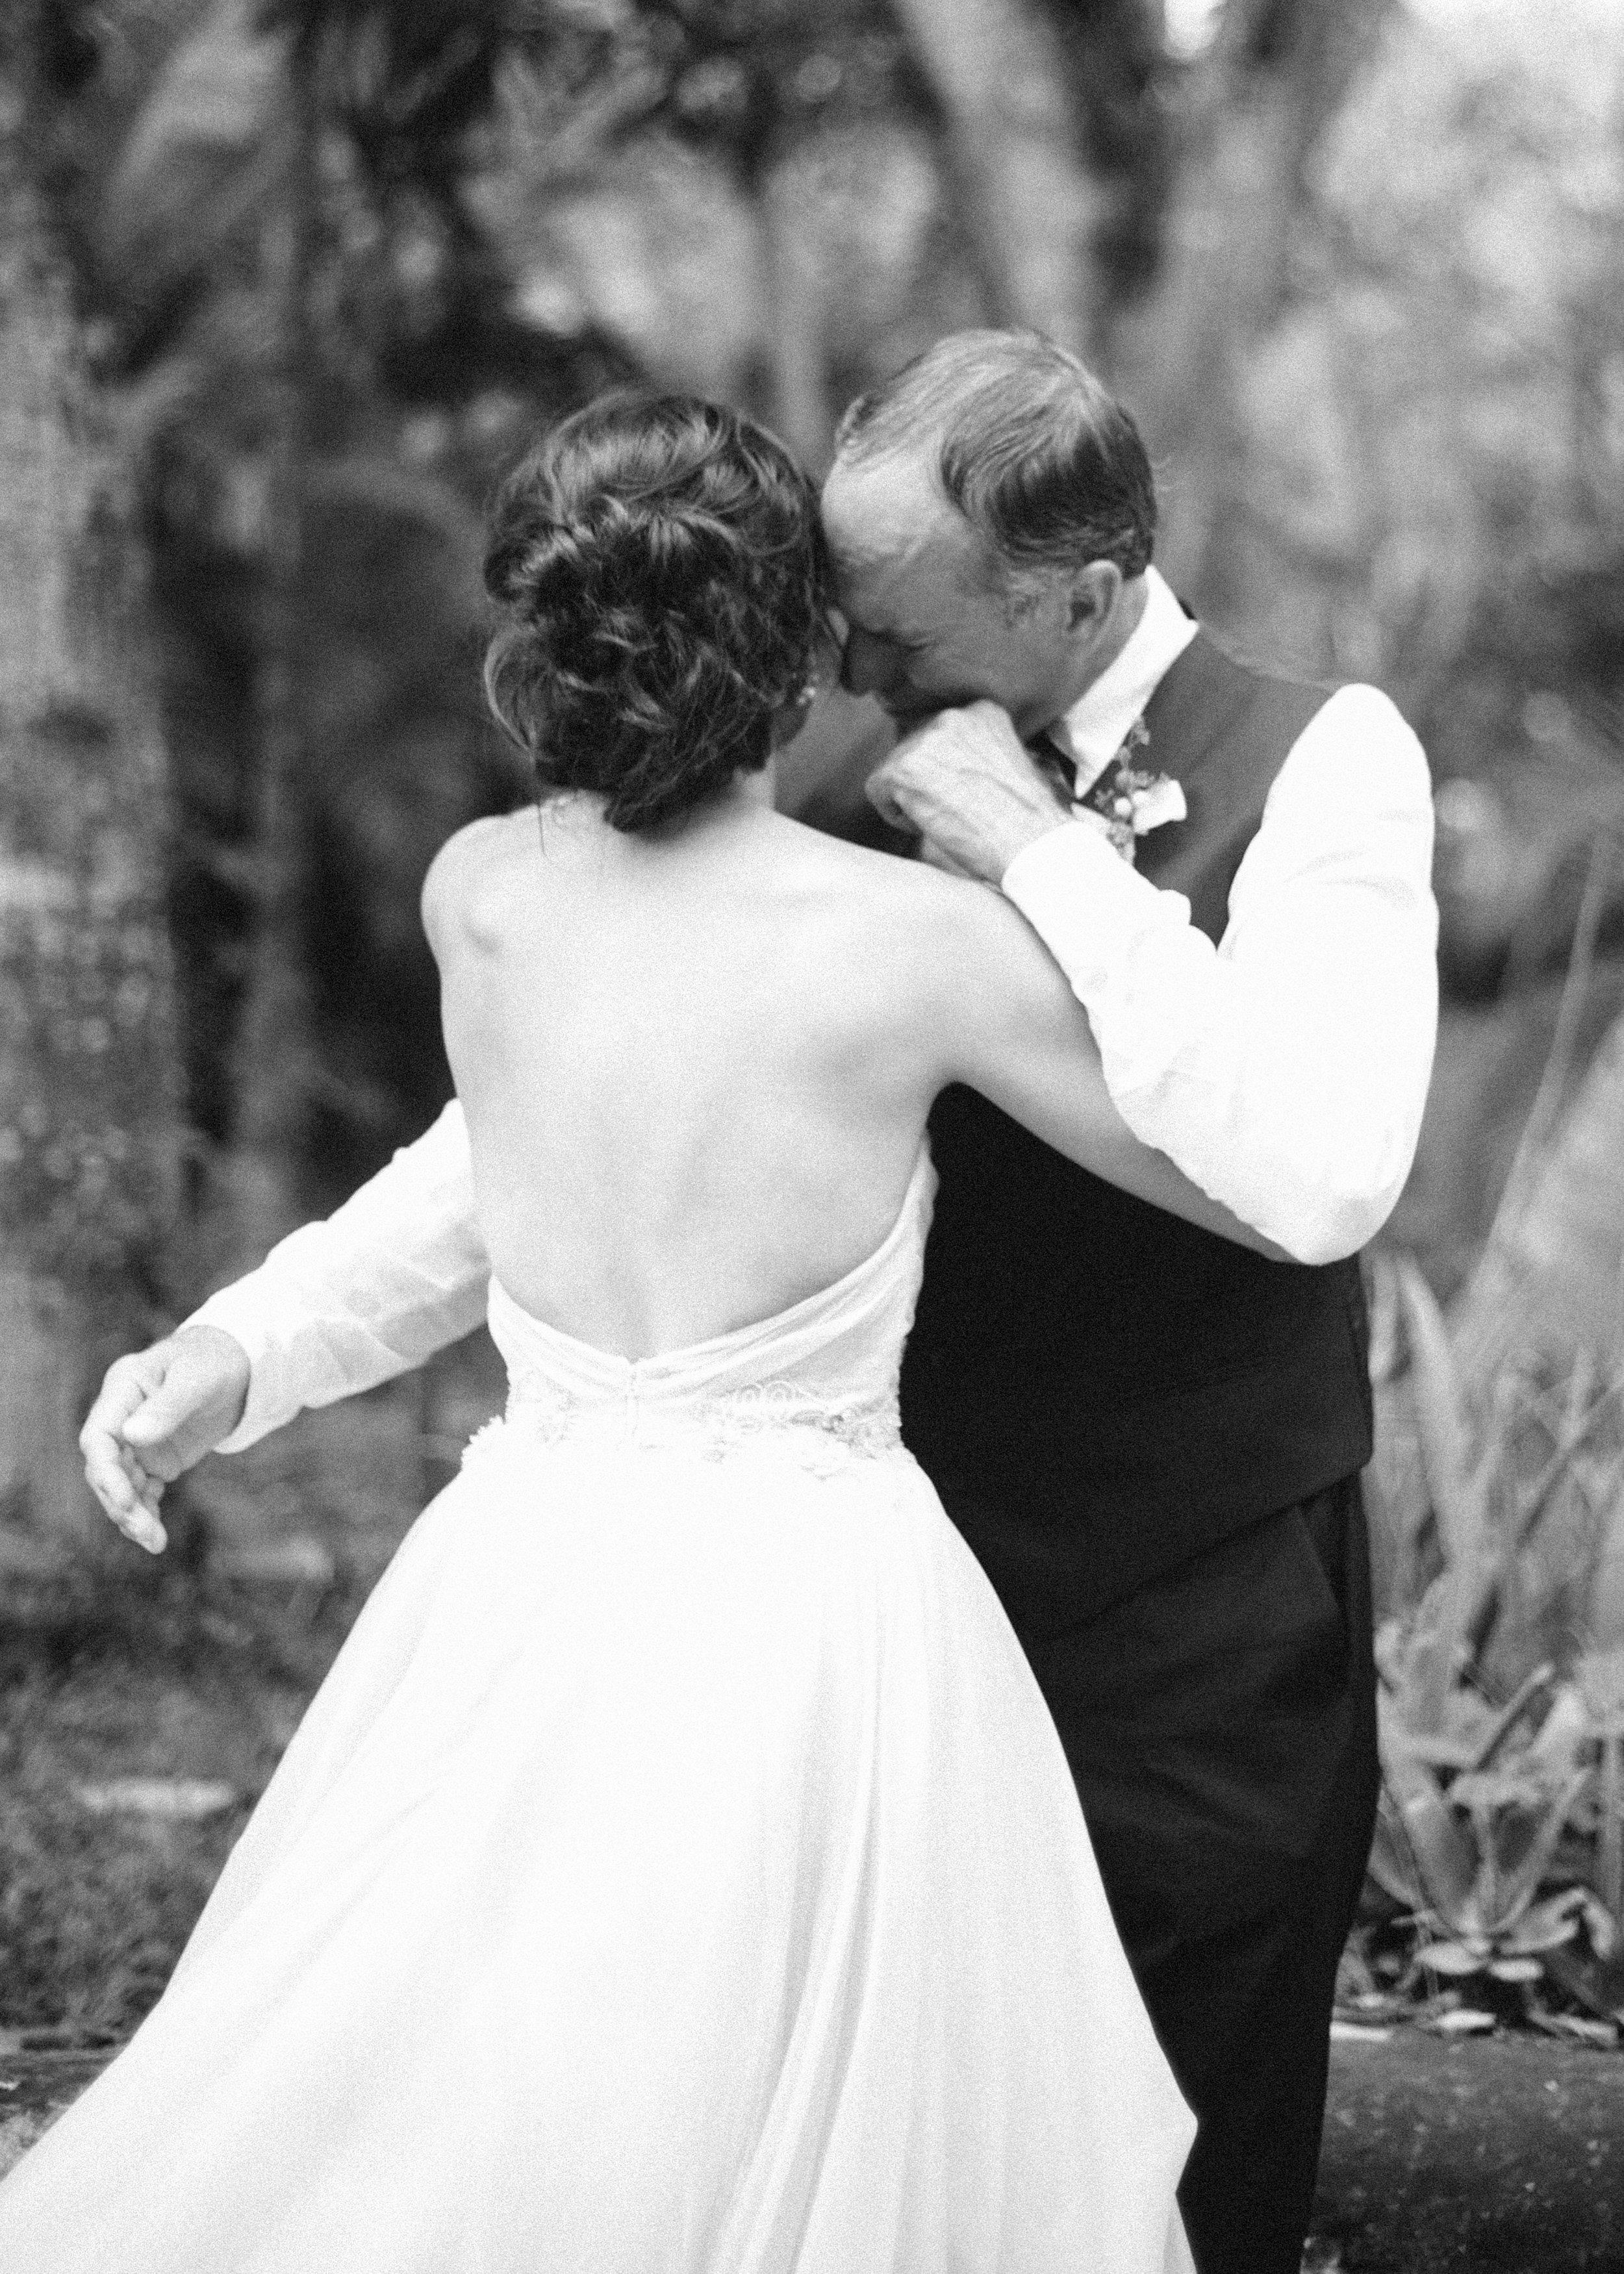 Ashleigh and Brian-Wedding Day-Carrie King Photographer-105.jpg